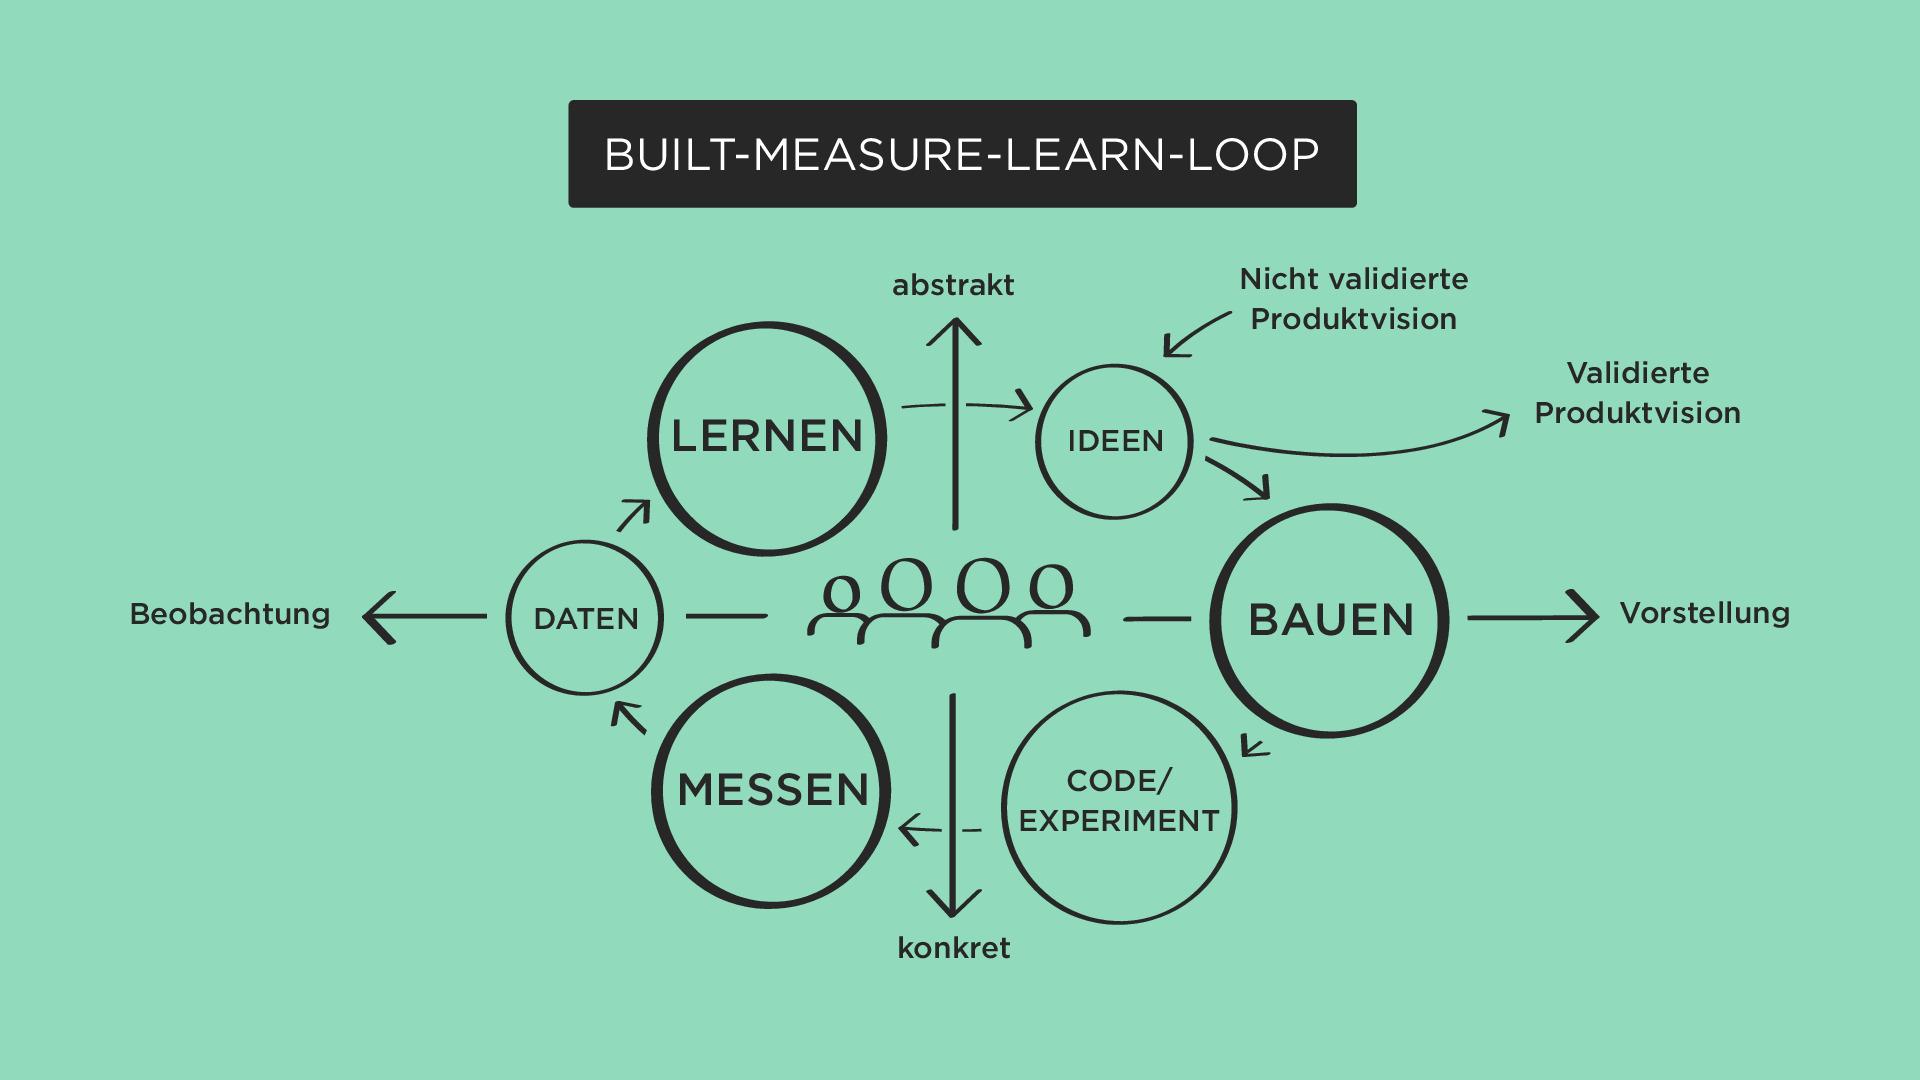 Built Measure Learn Loop_Illustration zum ZAK-Kurs Agile Teamarbeit